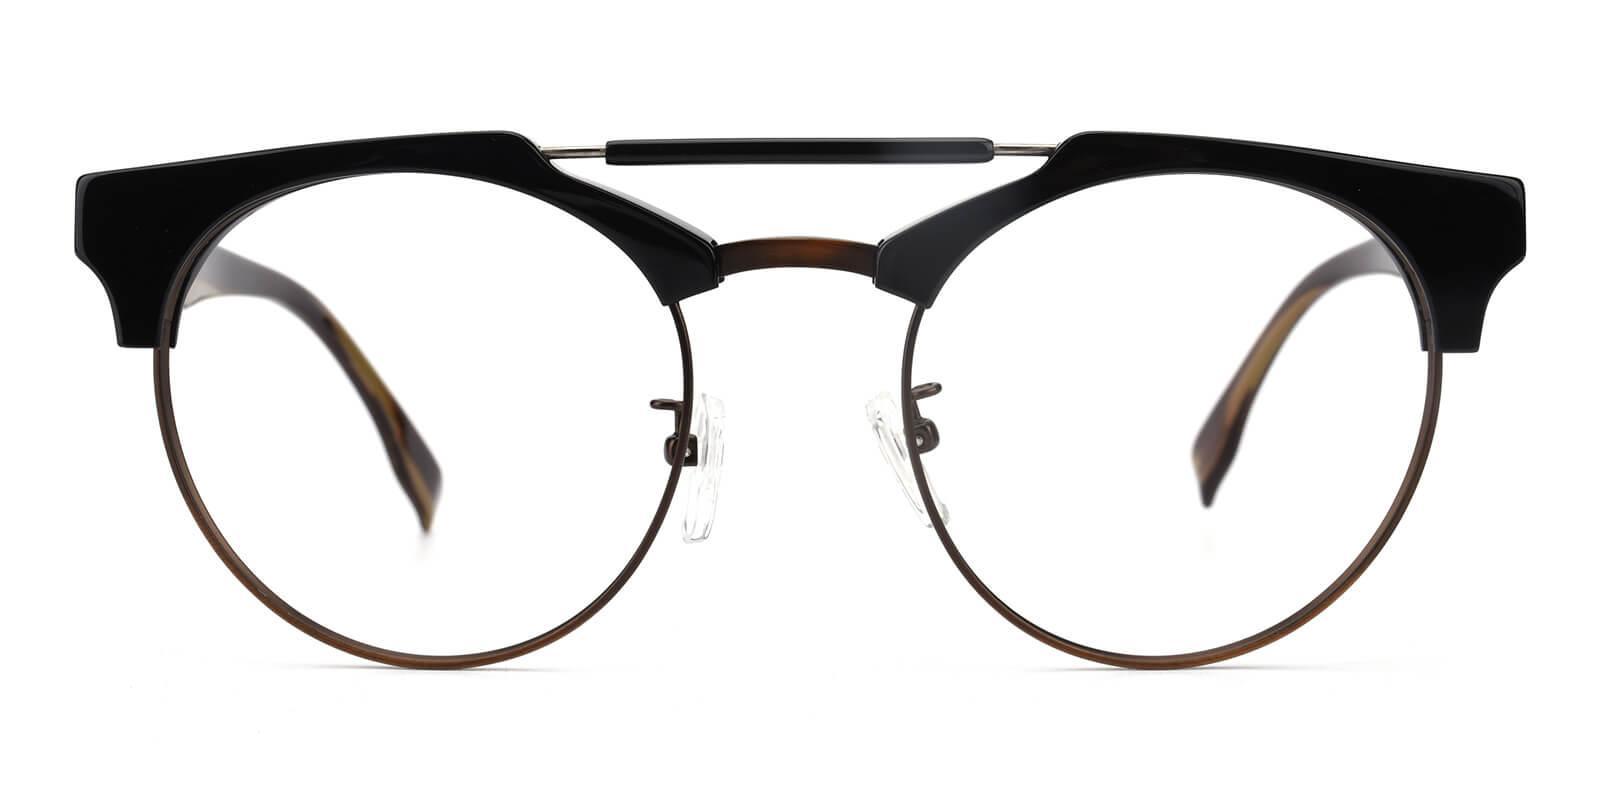 Ombama-Brown-Browline-Combination-Eyeglasses-additional2